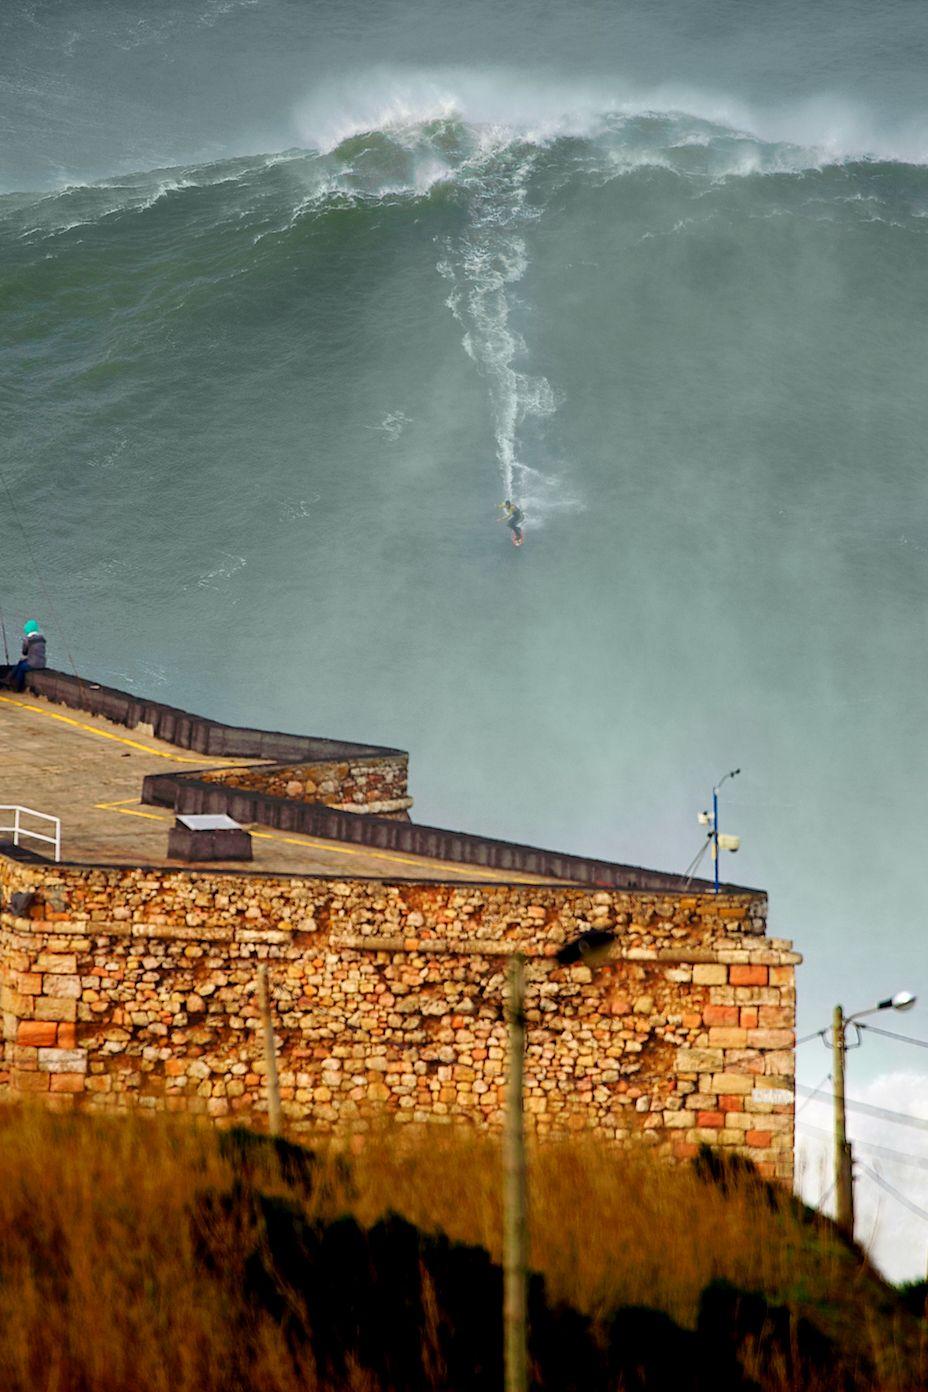 Garrett McNamara surfing a 100ft wave at Praia do Norte, Nazaré, Portugal